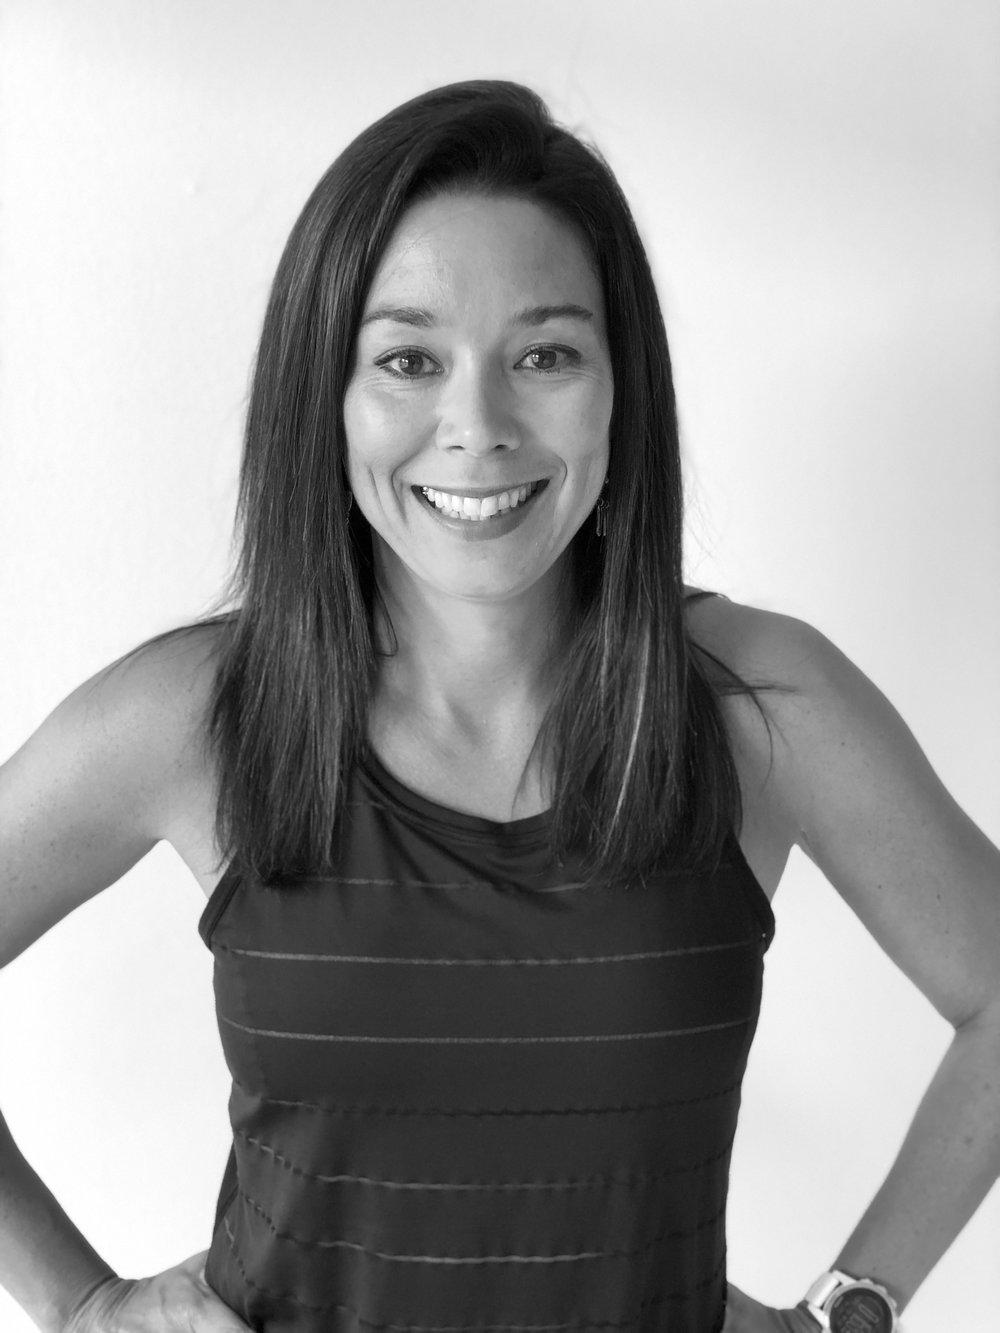 Jennifer Sorin, RYT 200